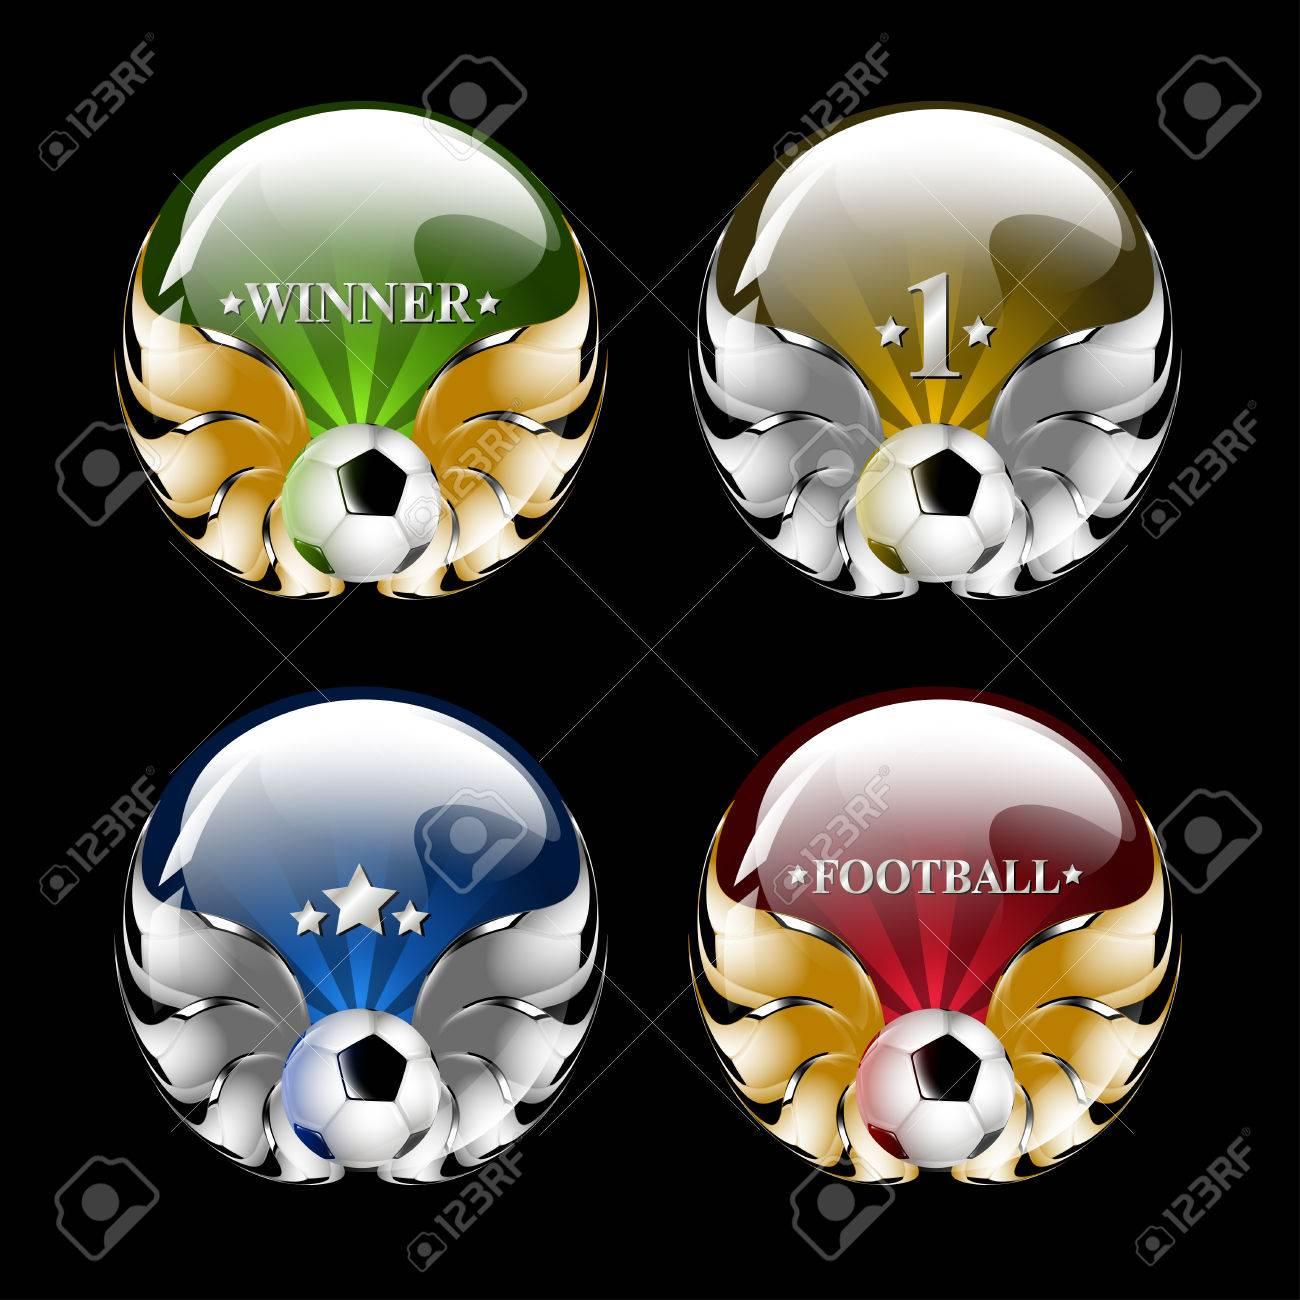 vector football emblem on a black background Stock Vector - 8254868